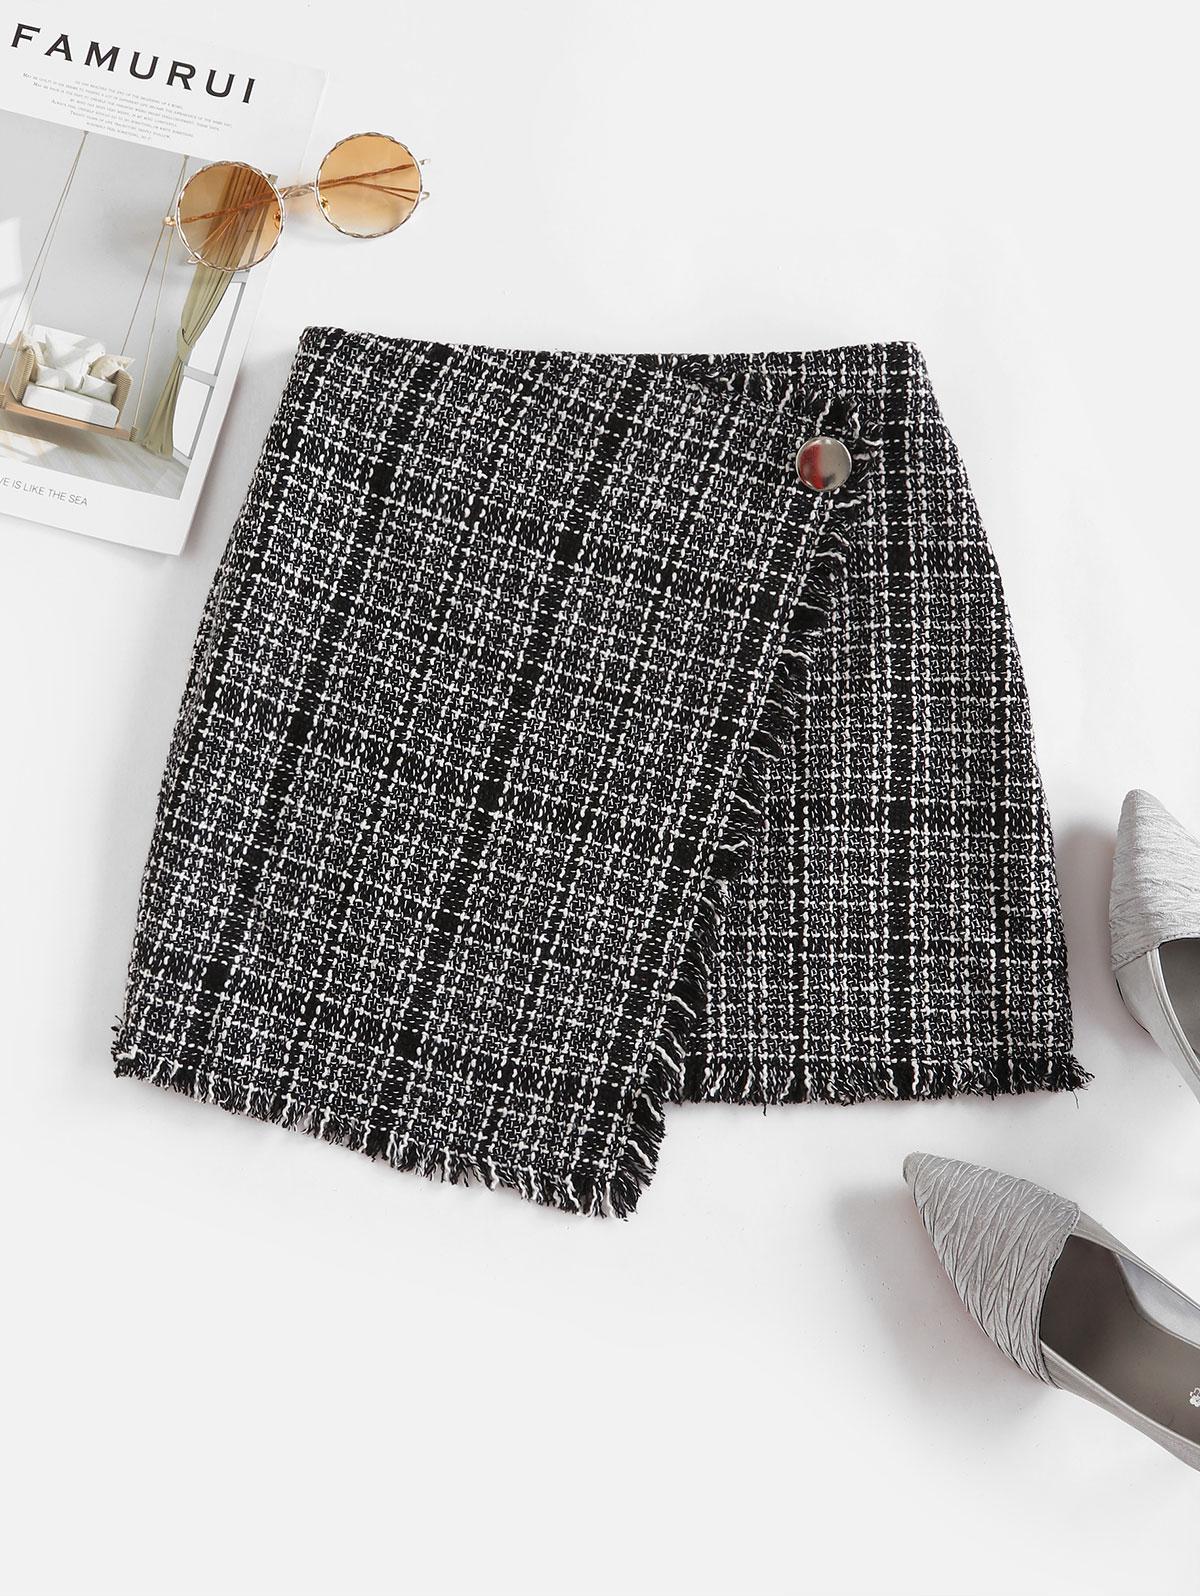 ZAFUL Tweed Faux Wrap Skirt, Black